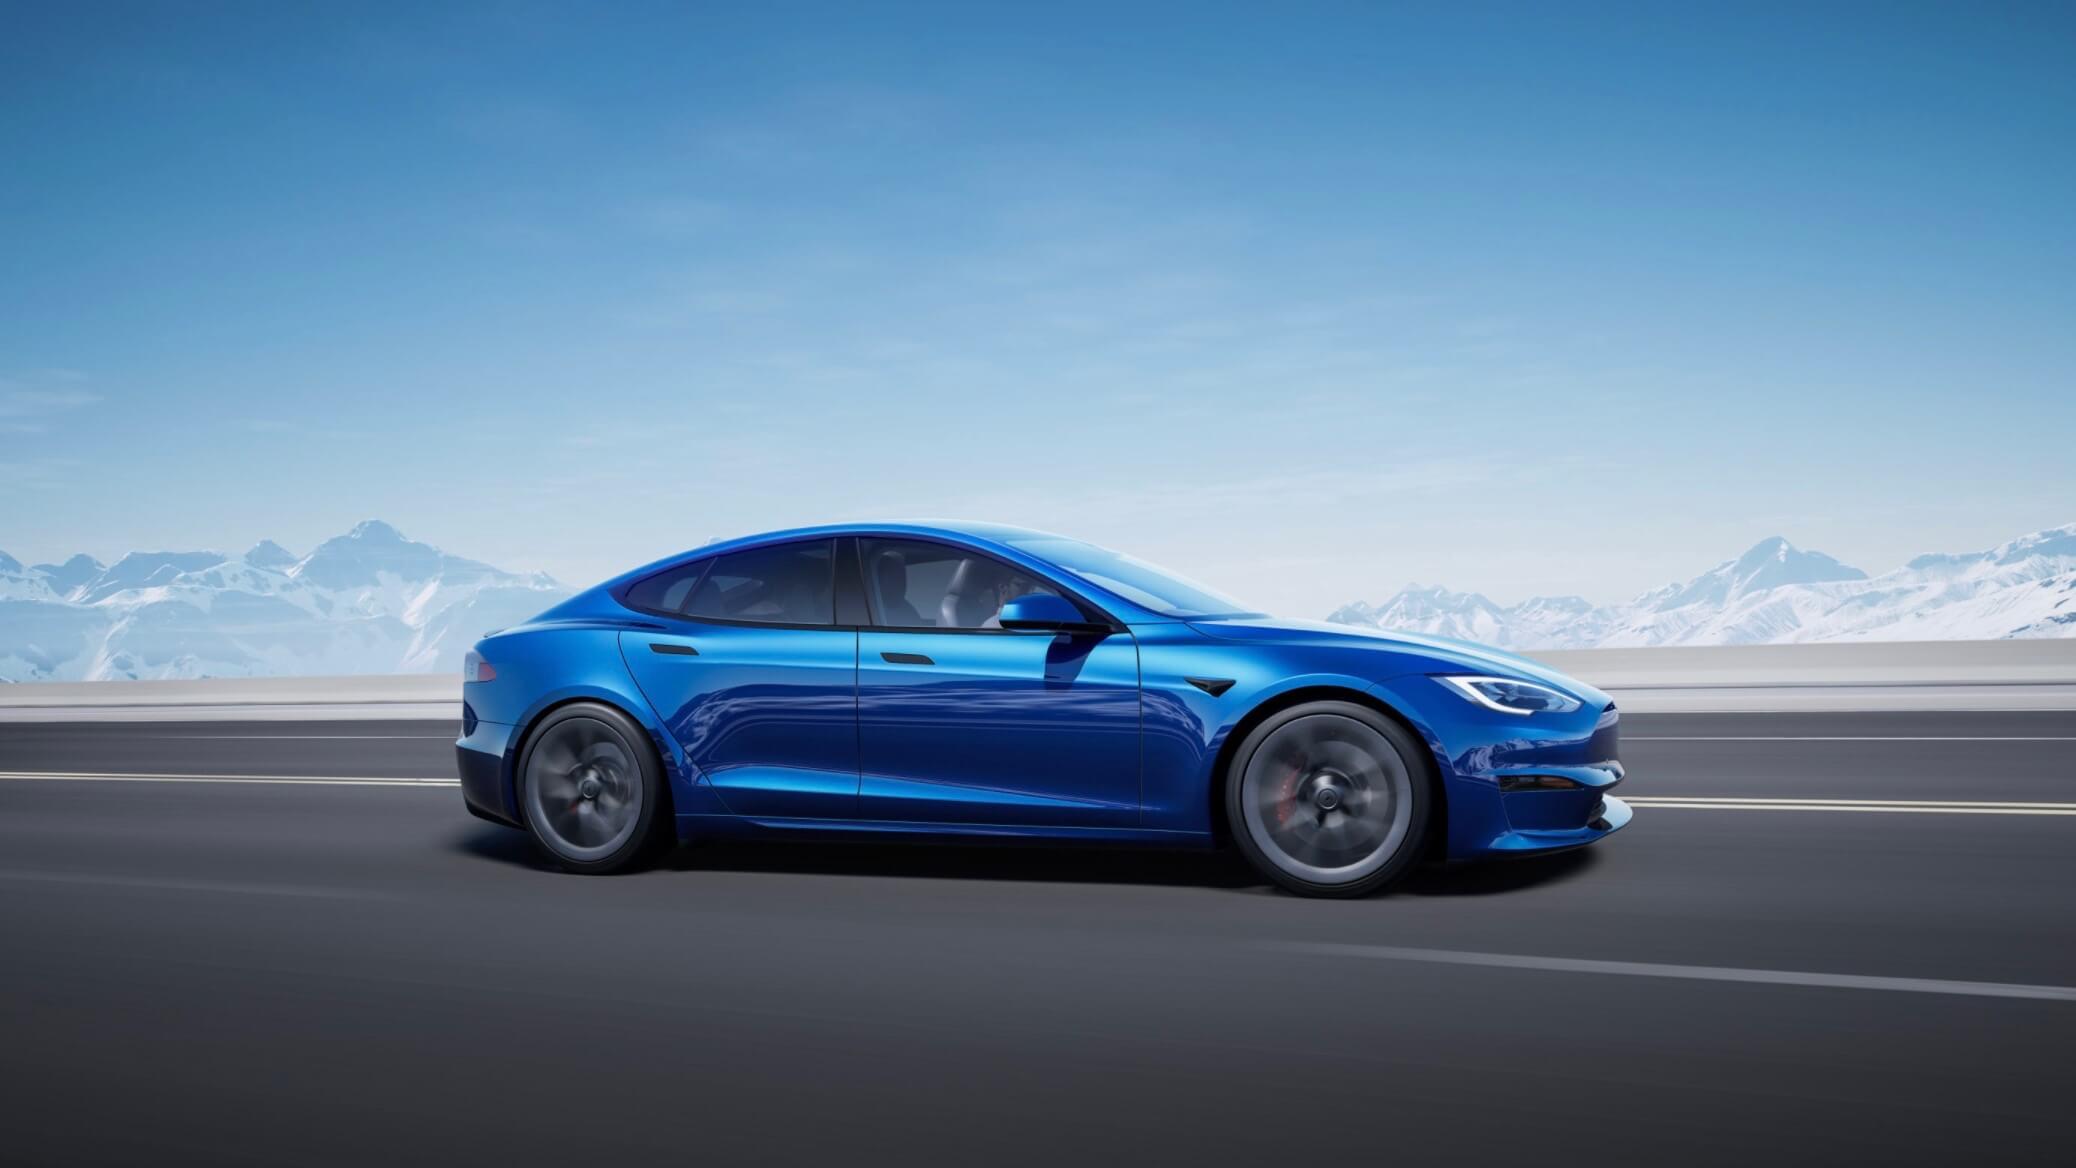 Tesla Model S azul